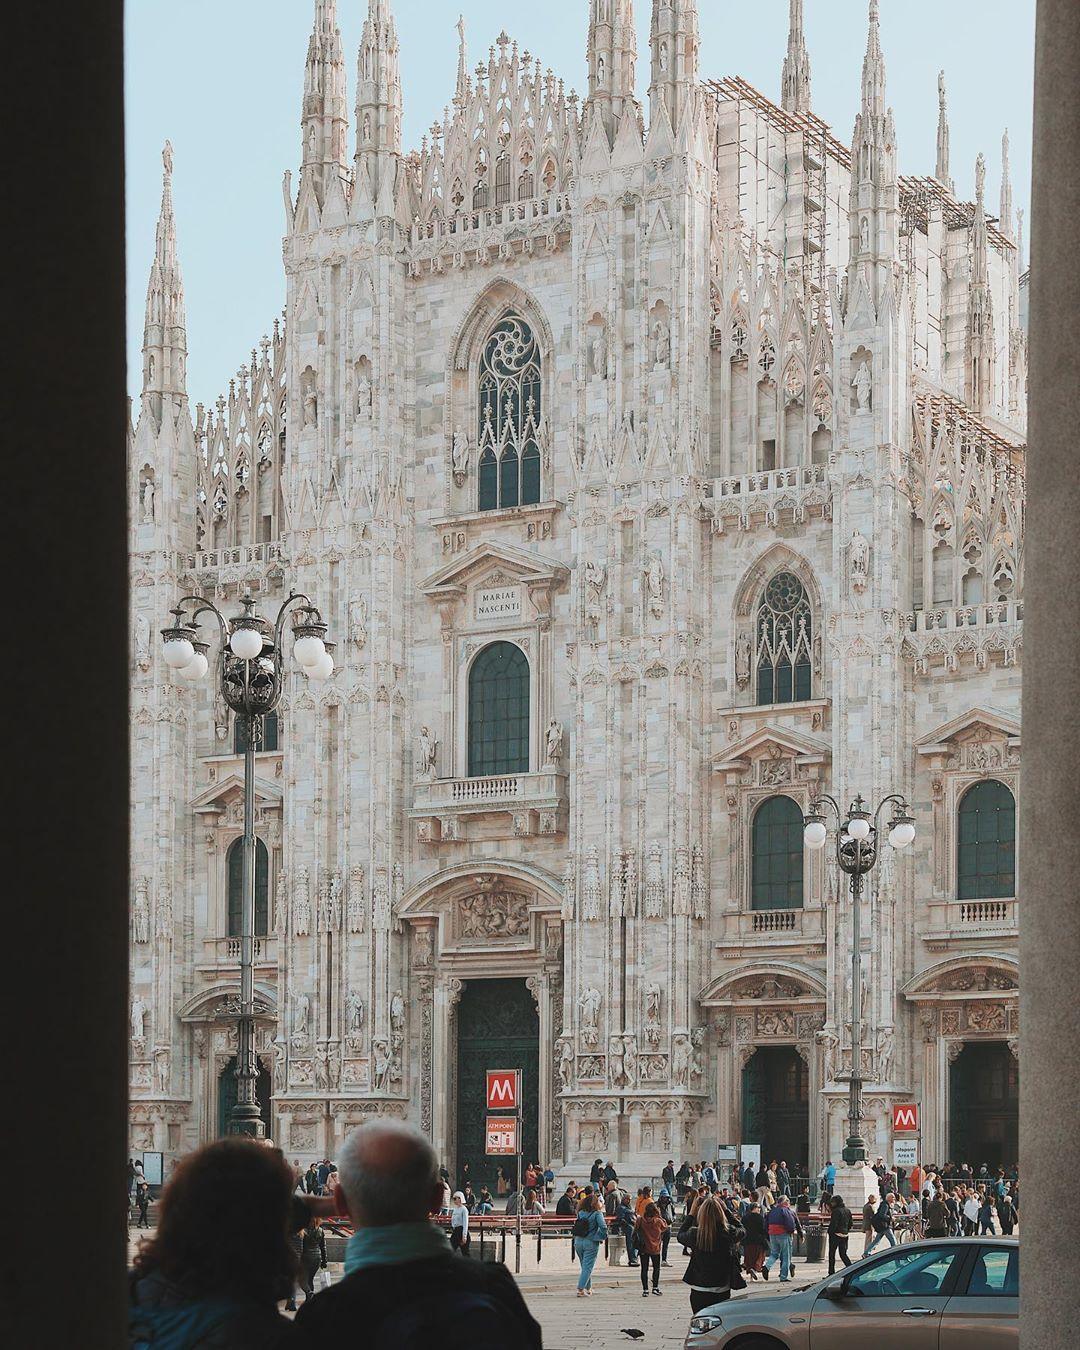 Duomo di Milano  .  .  .  #milano #milan #milanitaly #italy #italy🇮🇹 #italytravel #visititaly #beautifuldestinations #citywalk #cityexplore #cityexplorer #urbanphotography #travelmood #travelphotography #gothic #architecturephotography #architecturephotography #duomo #duomomilano #cathedral